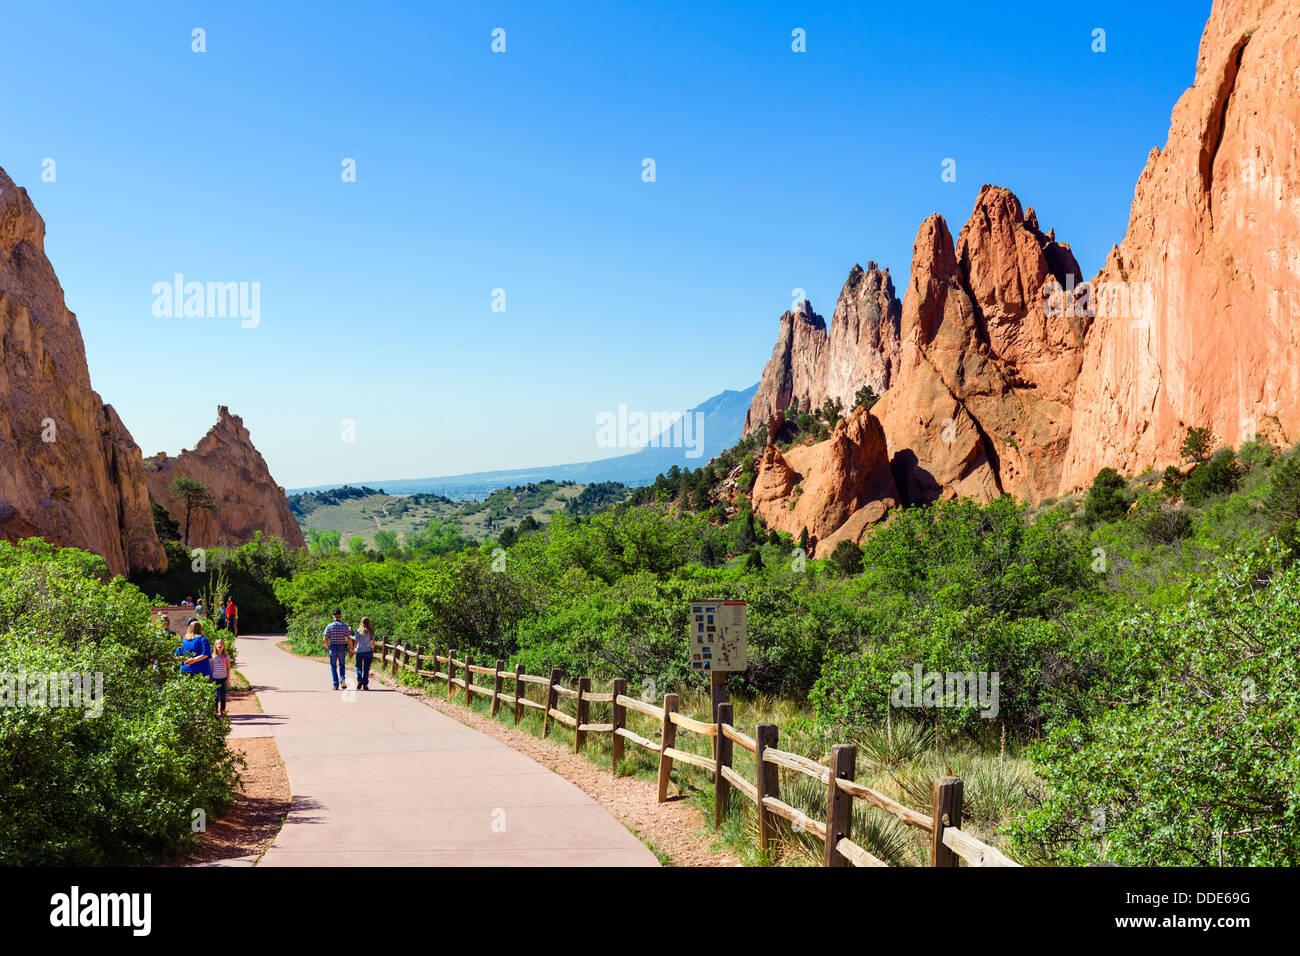 Walkers in the Garden of The Gods public park, Colorado Springs, Colorado, USA - Stock Image